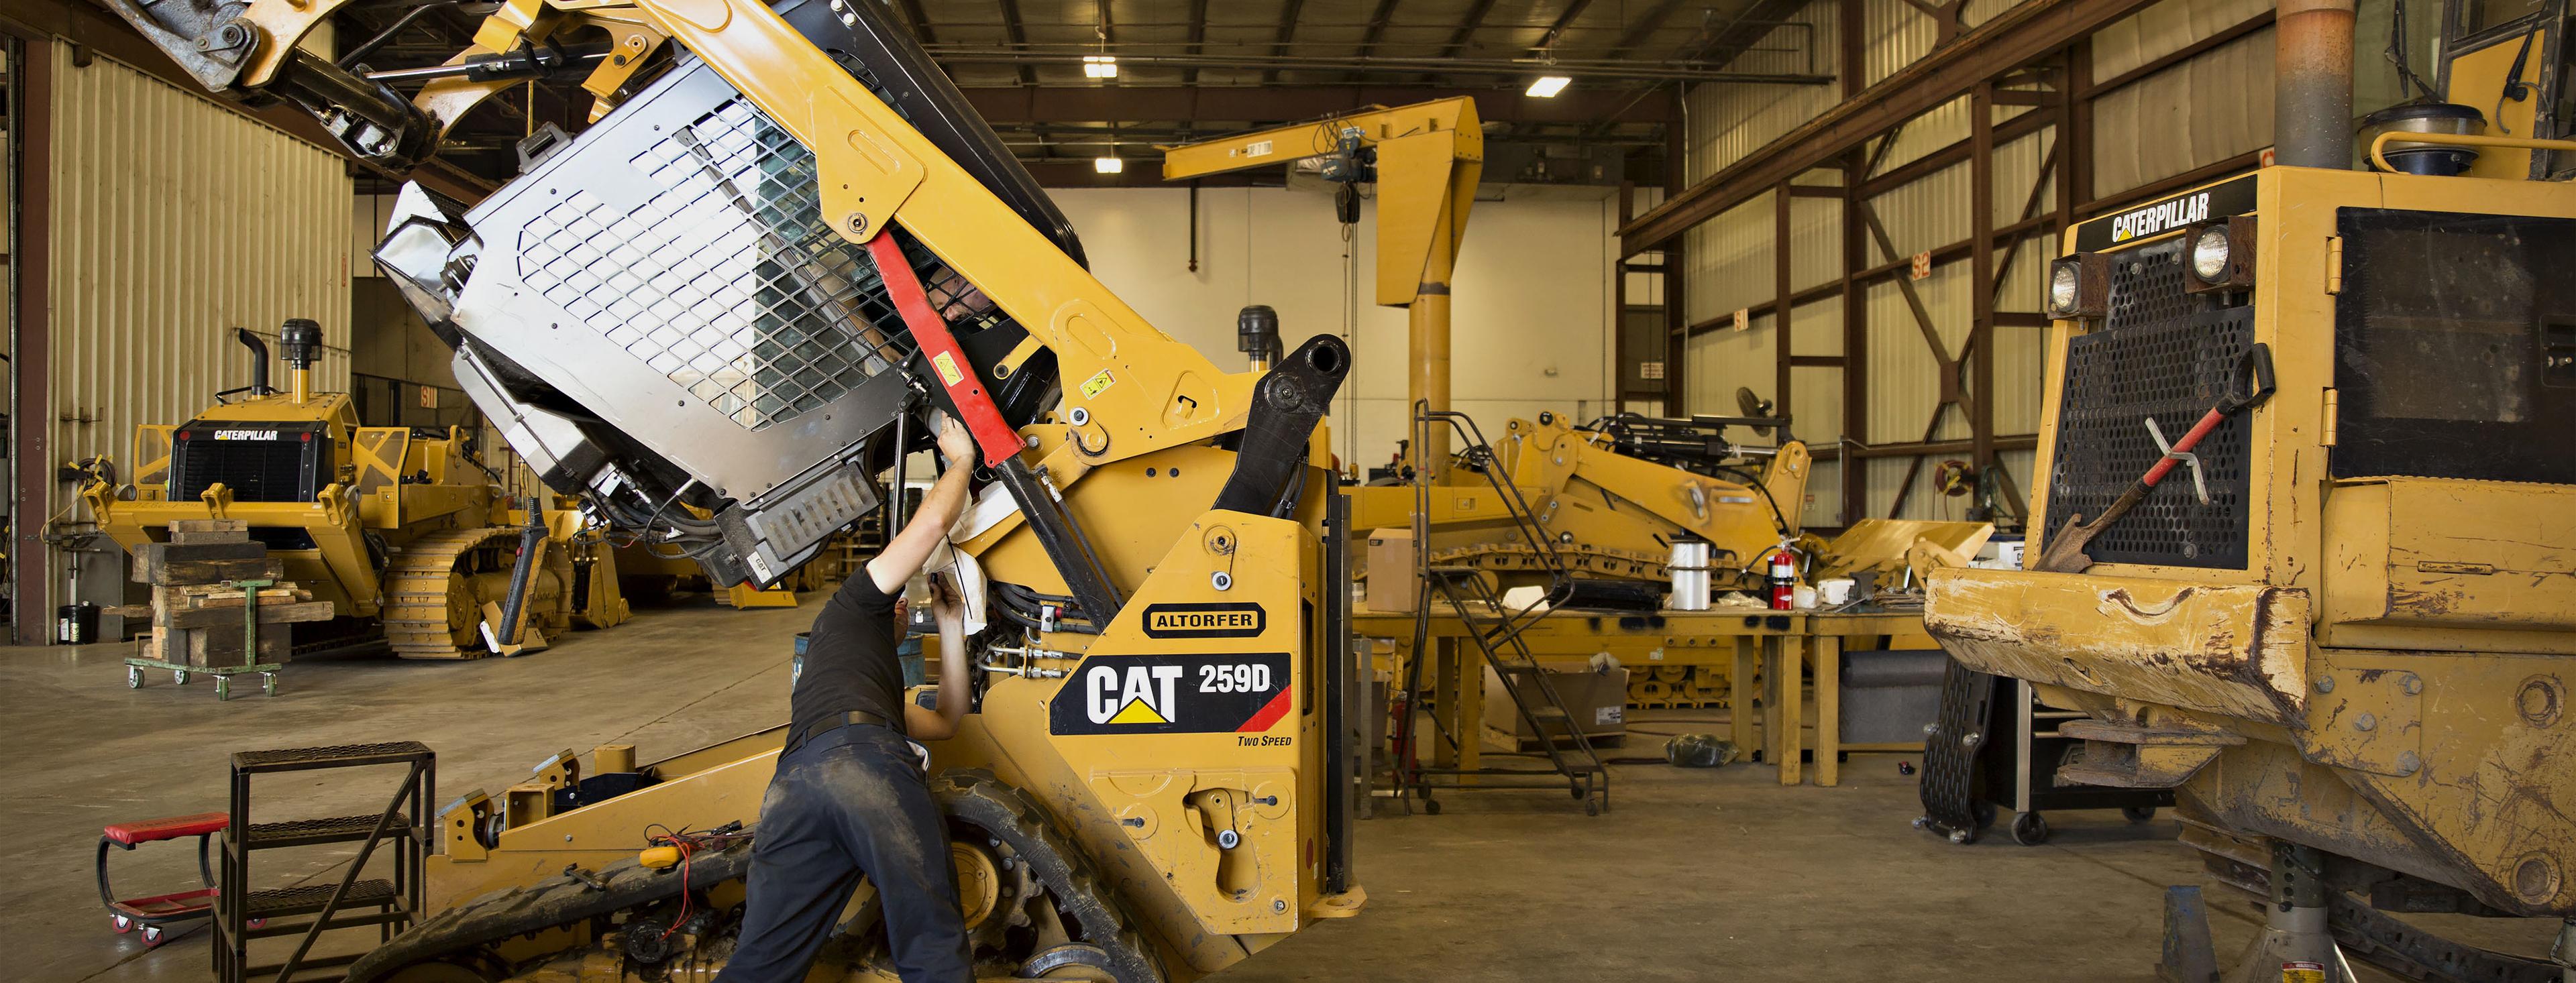 A Caterpillar Inc. Equipment Dealer Ahead Of Earnings